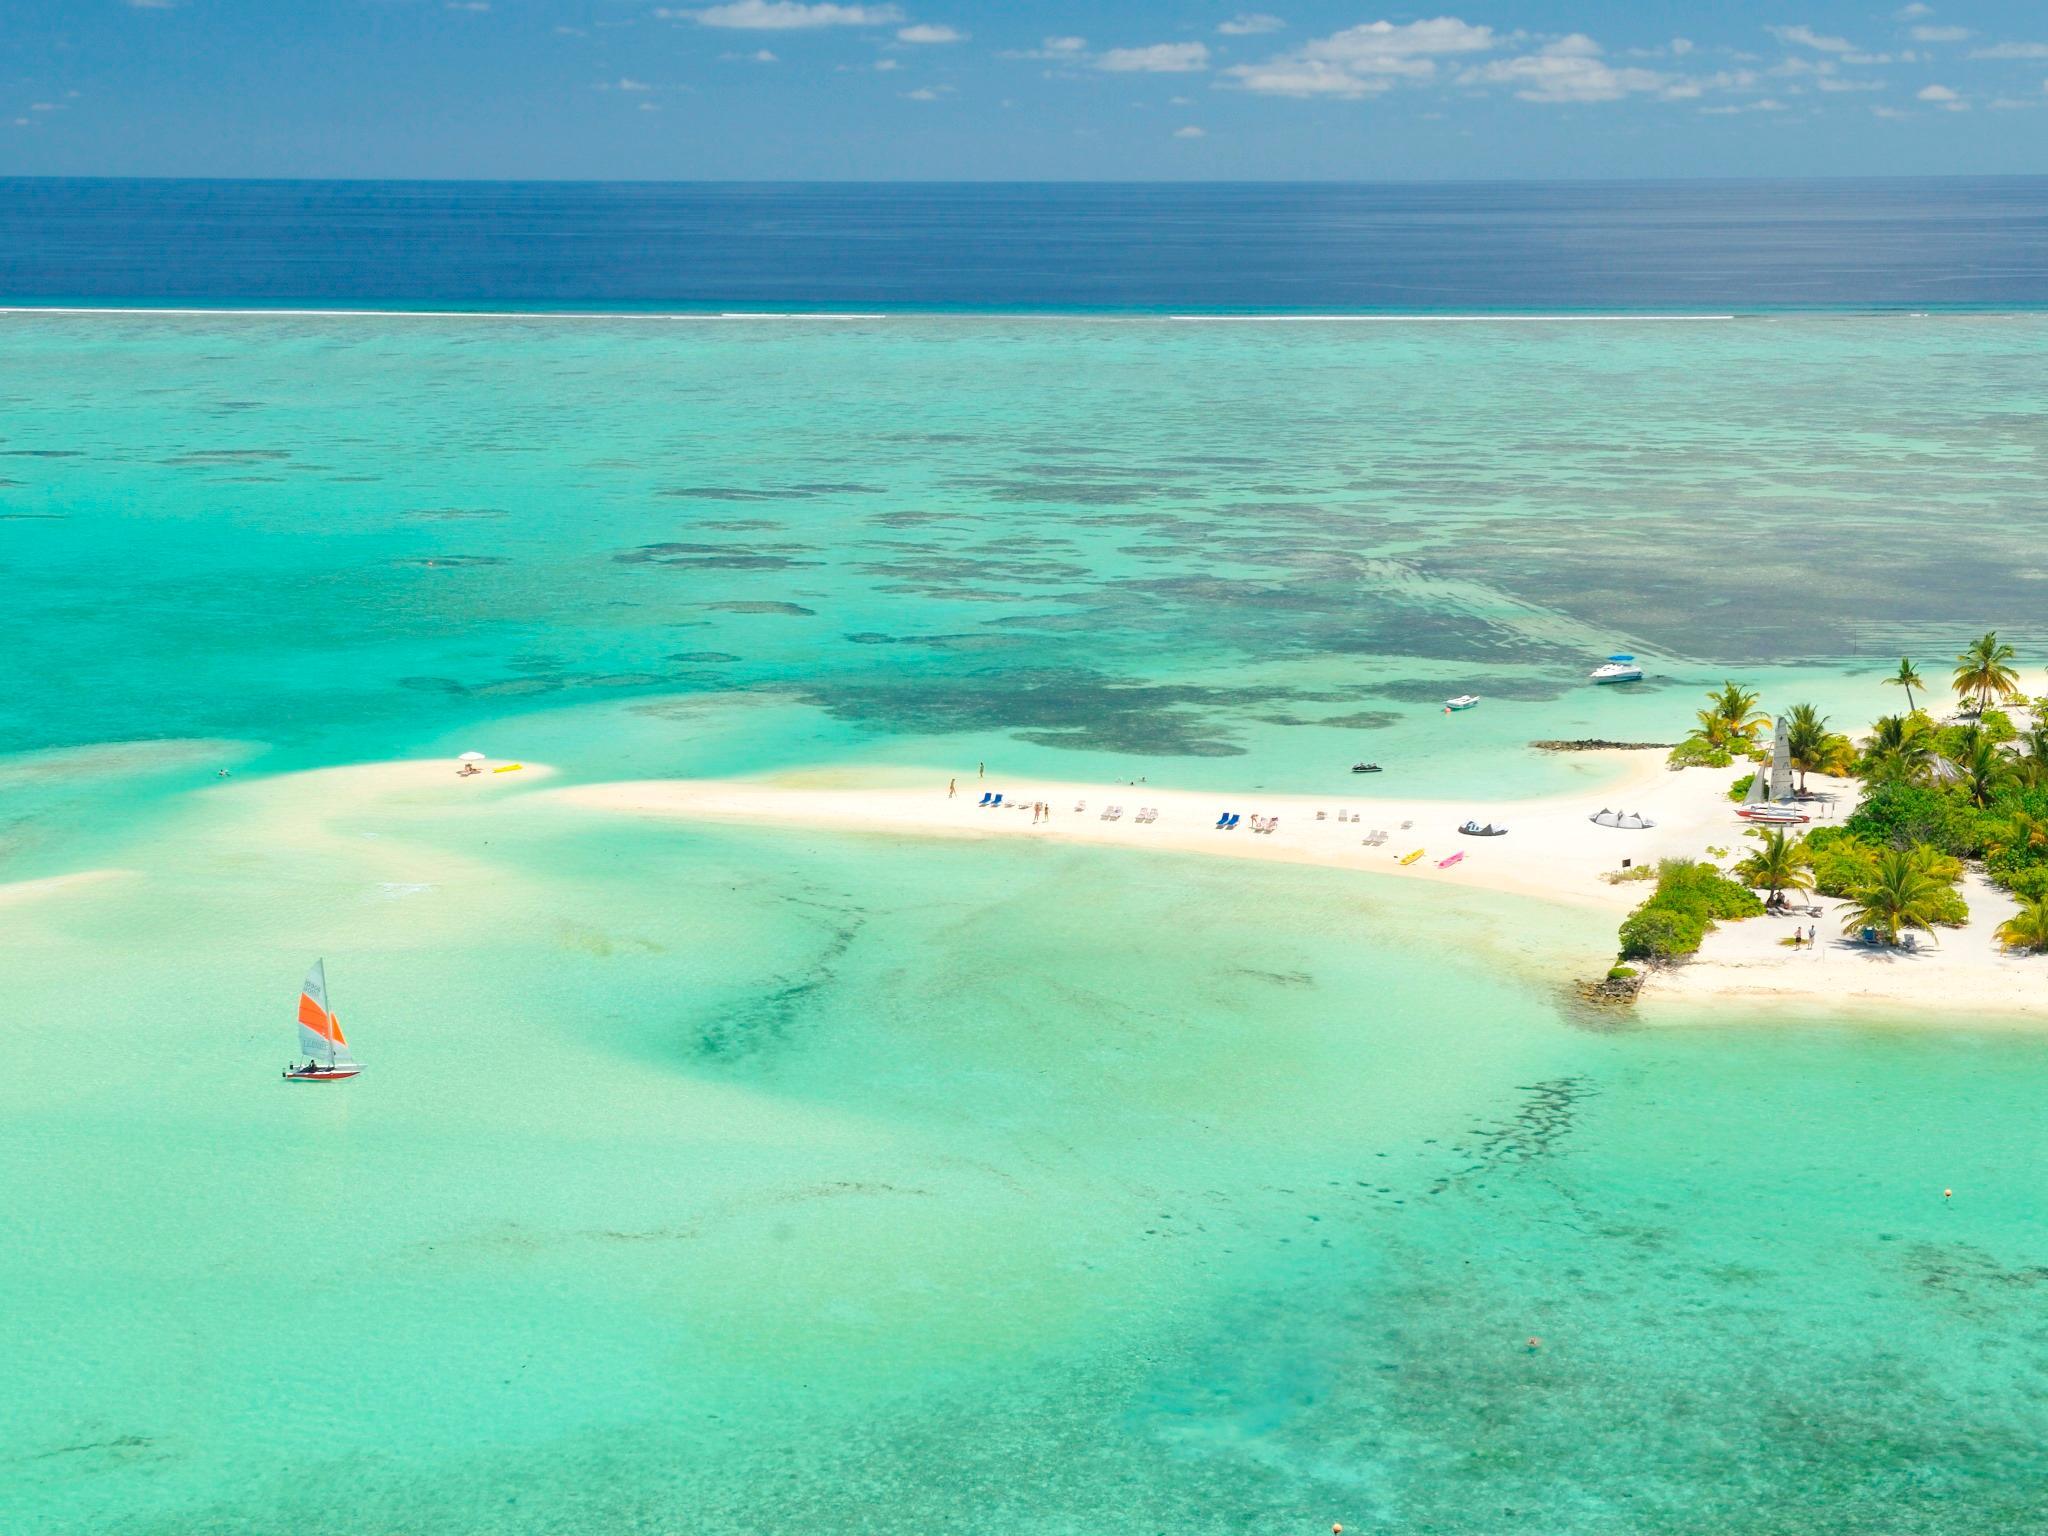 Fun Island Resort Maldives Islands Maldives